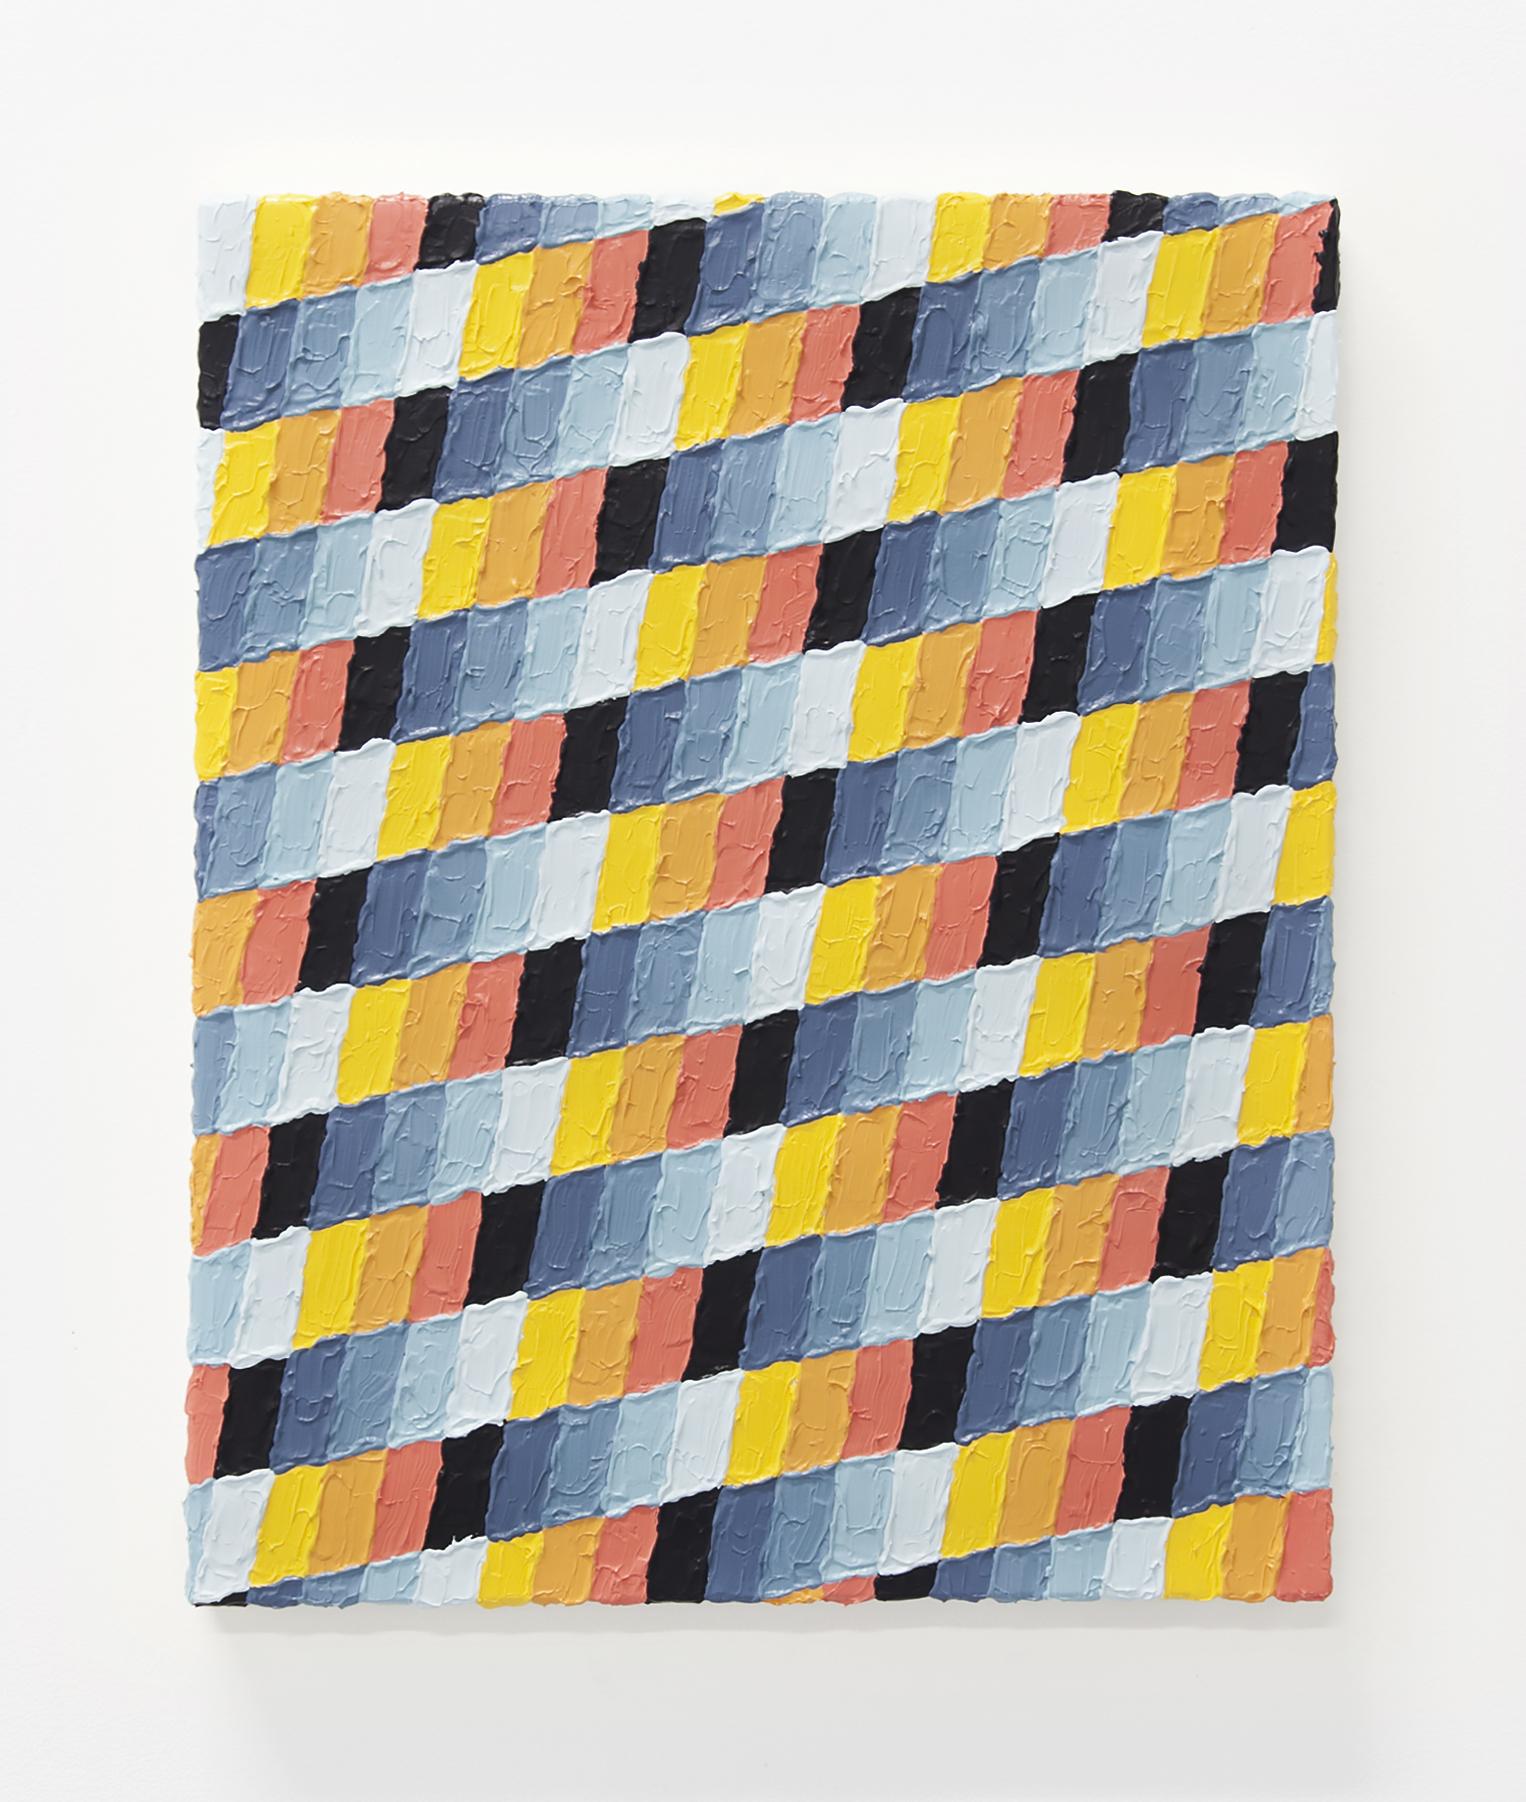 A Cautionary Tale, A Humble Brag  Acrylic, canvas  20 x 24 inches  2014